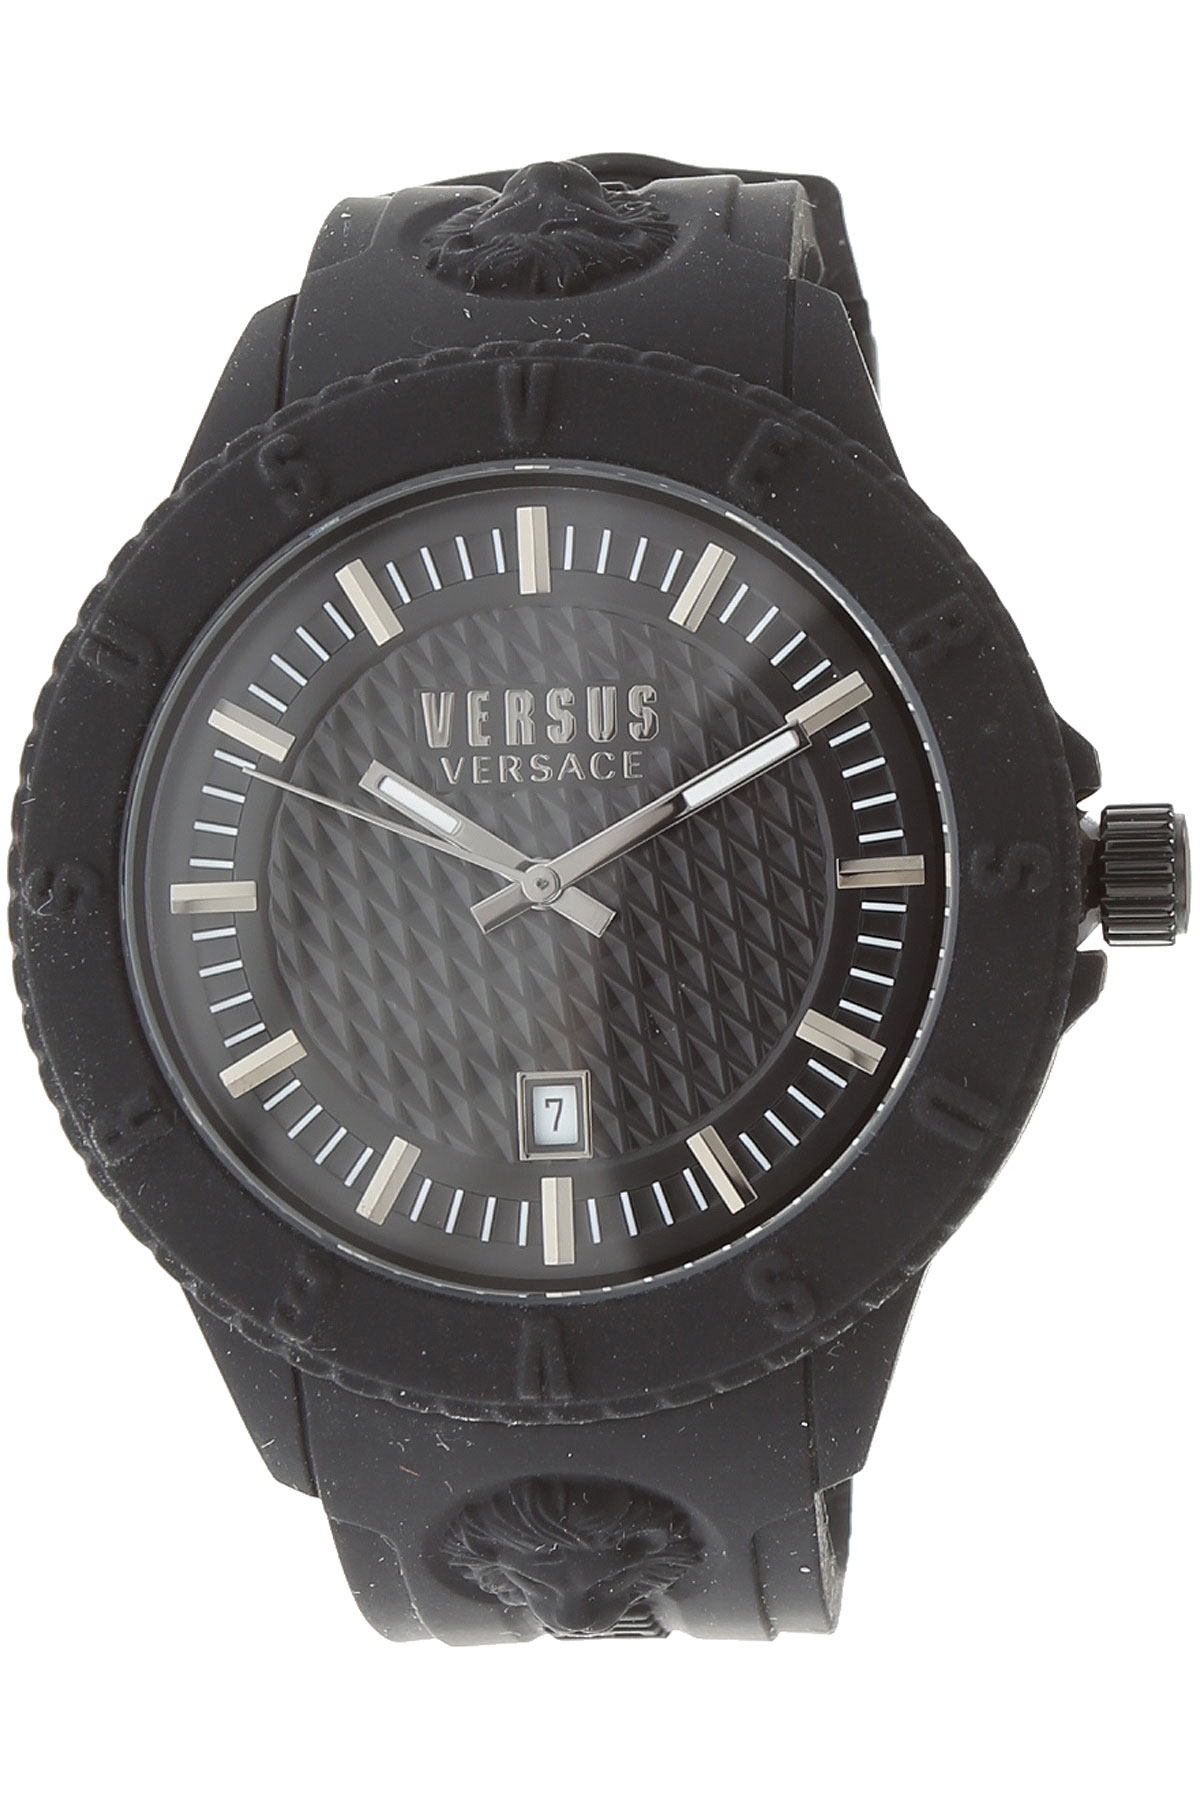 Versace_Watch_for_Women_On_Sale,_Black,_Rubber,_2019